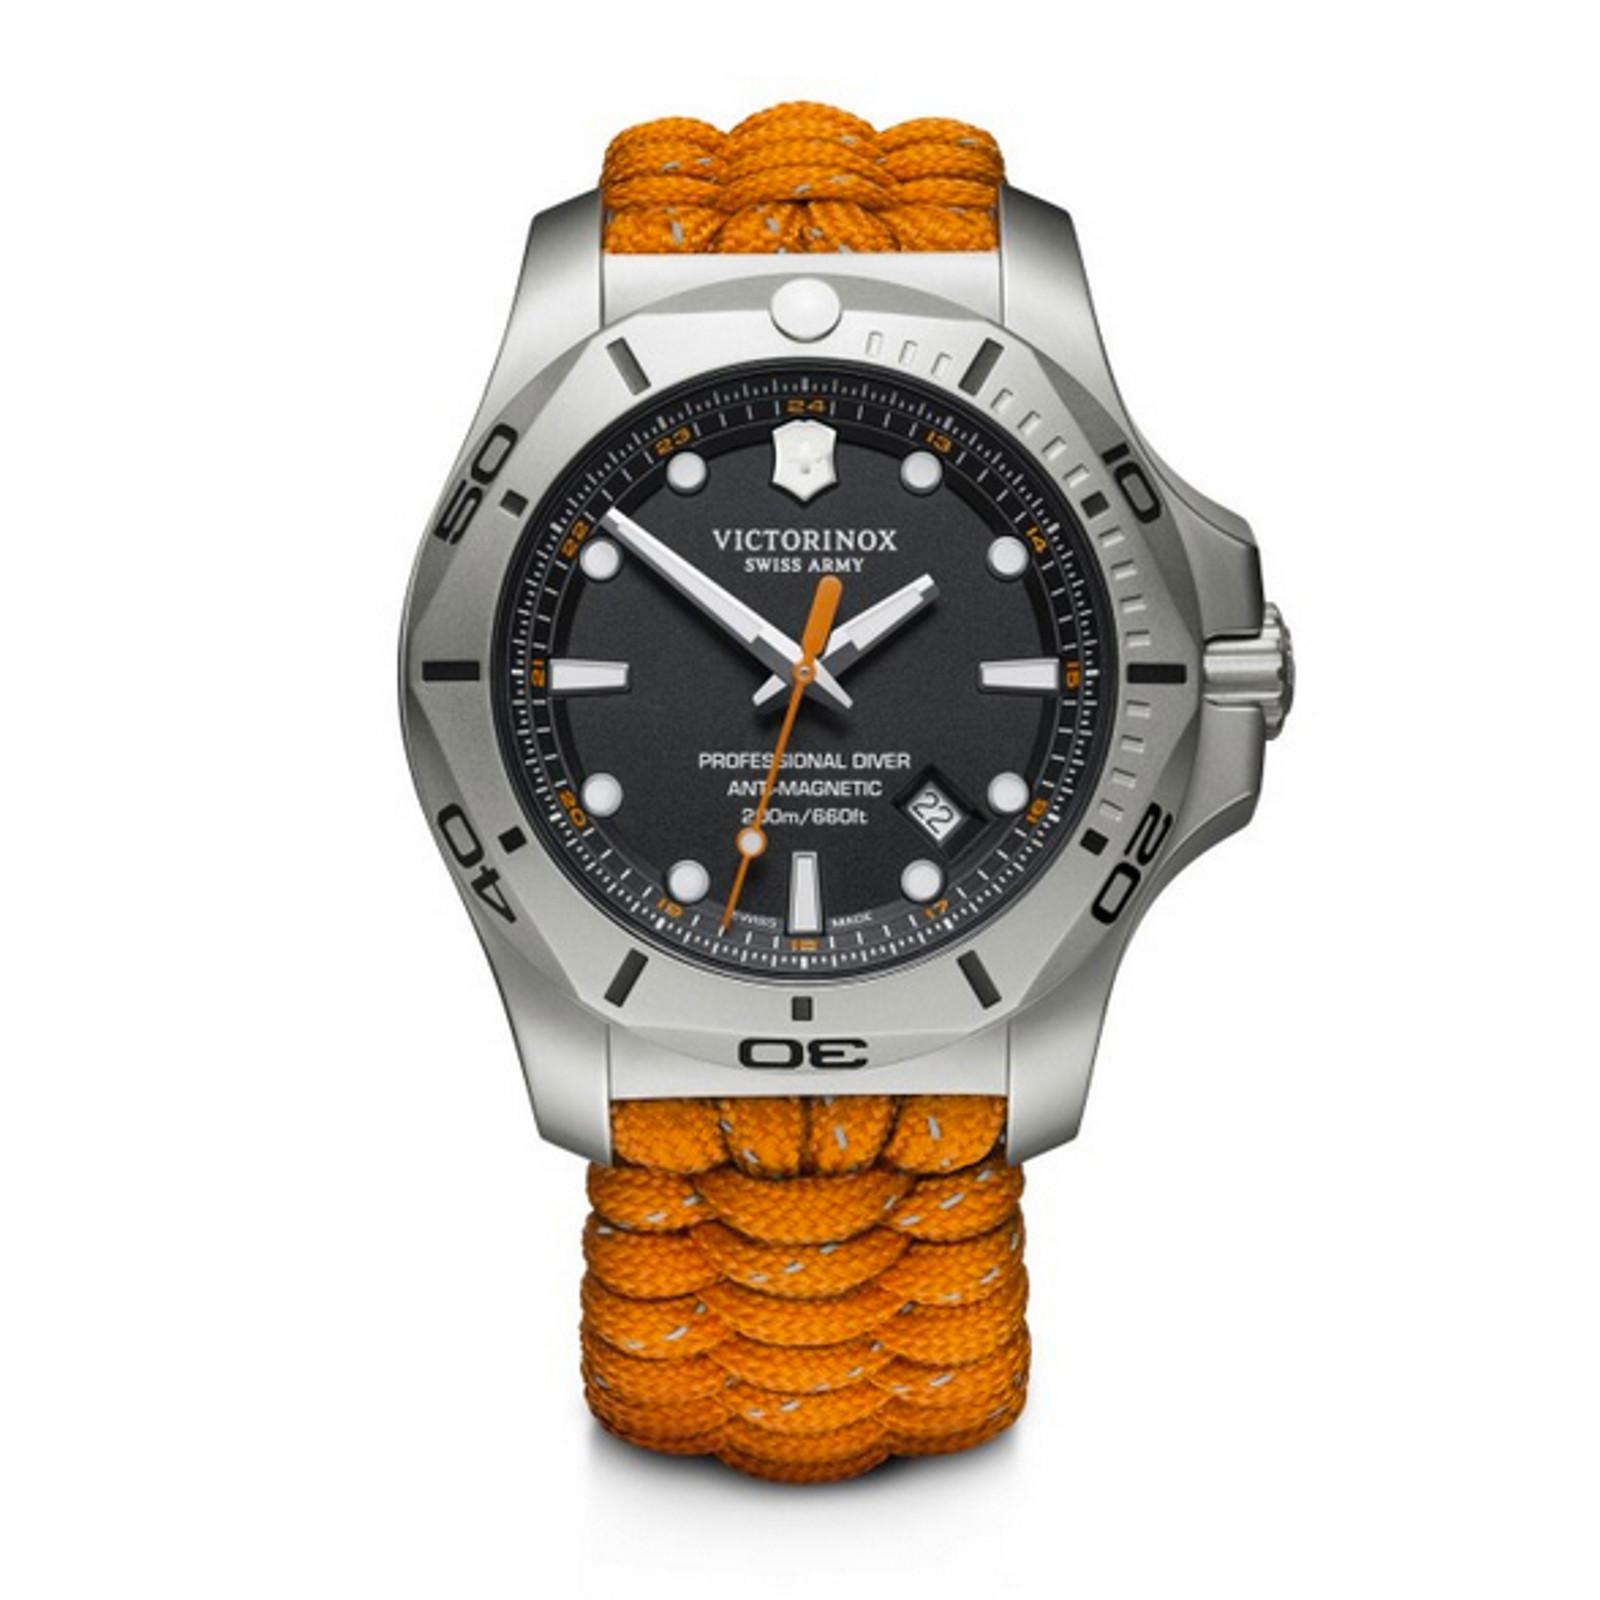 Victorinox INOX Professional Diver  (241845)